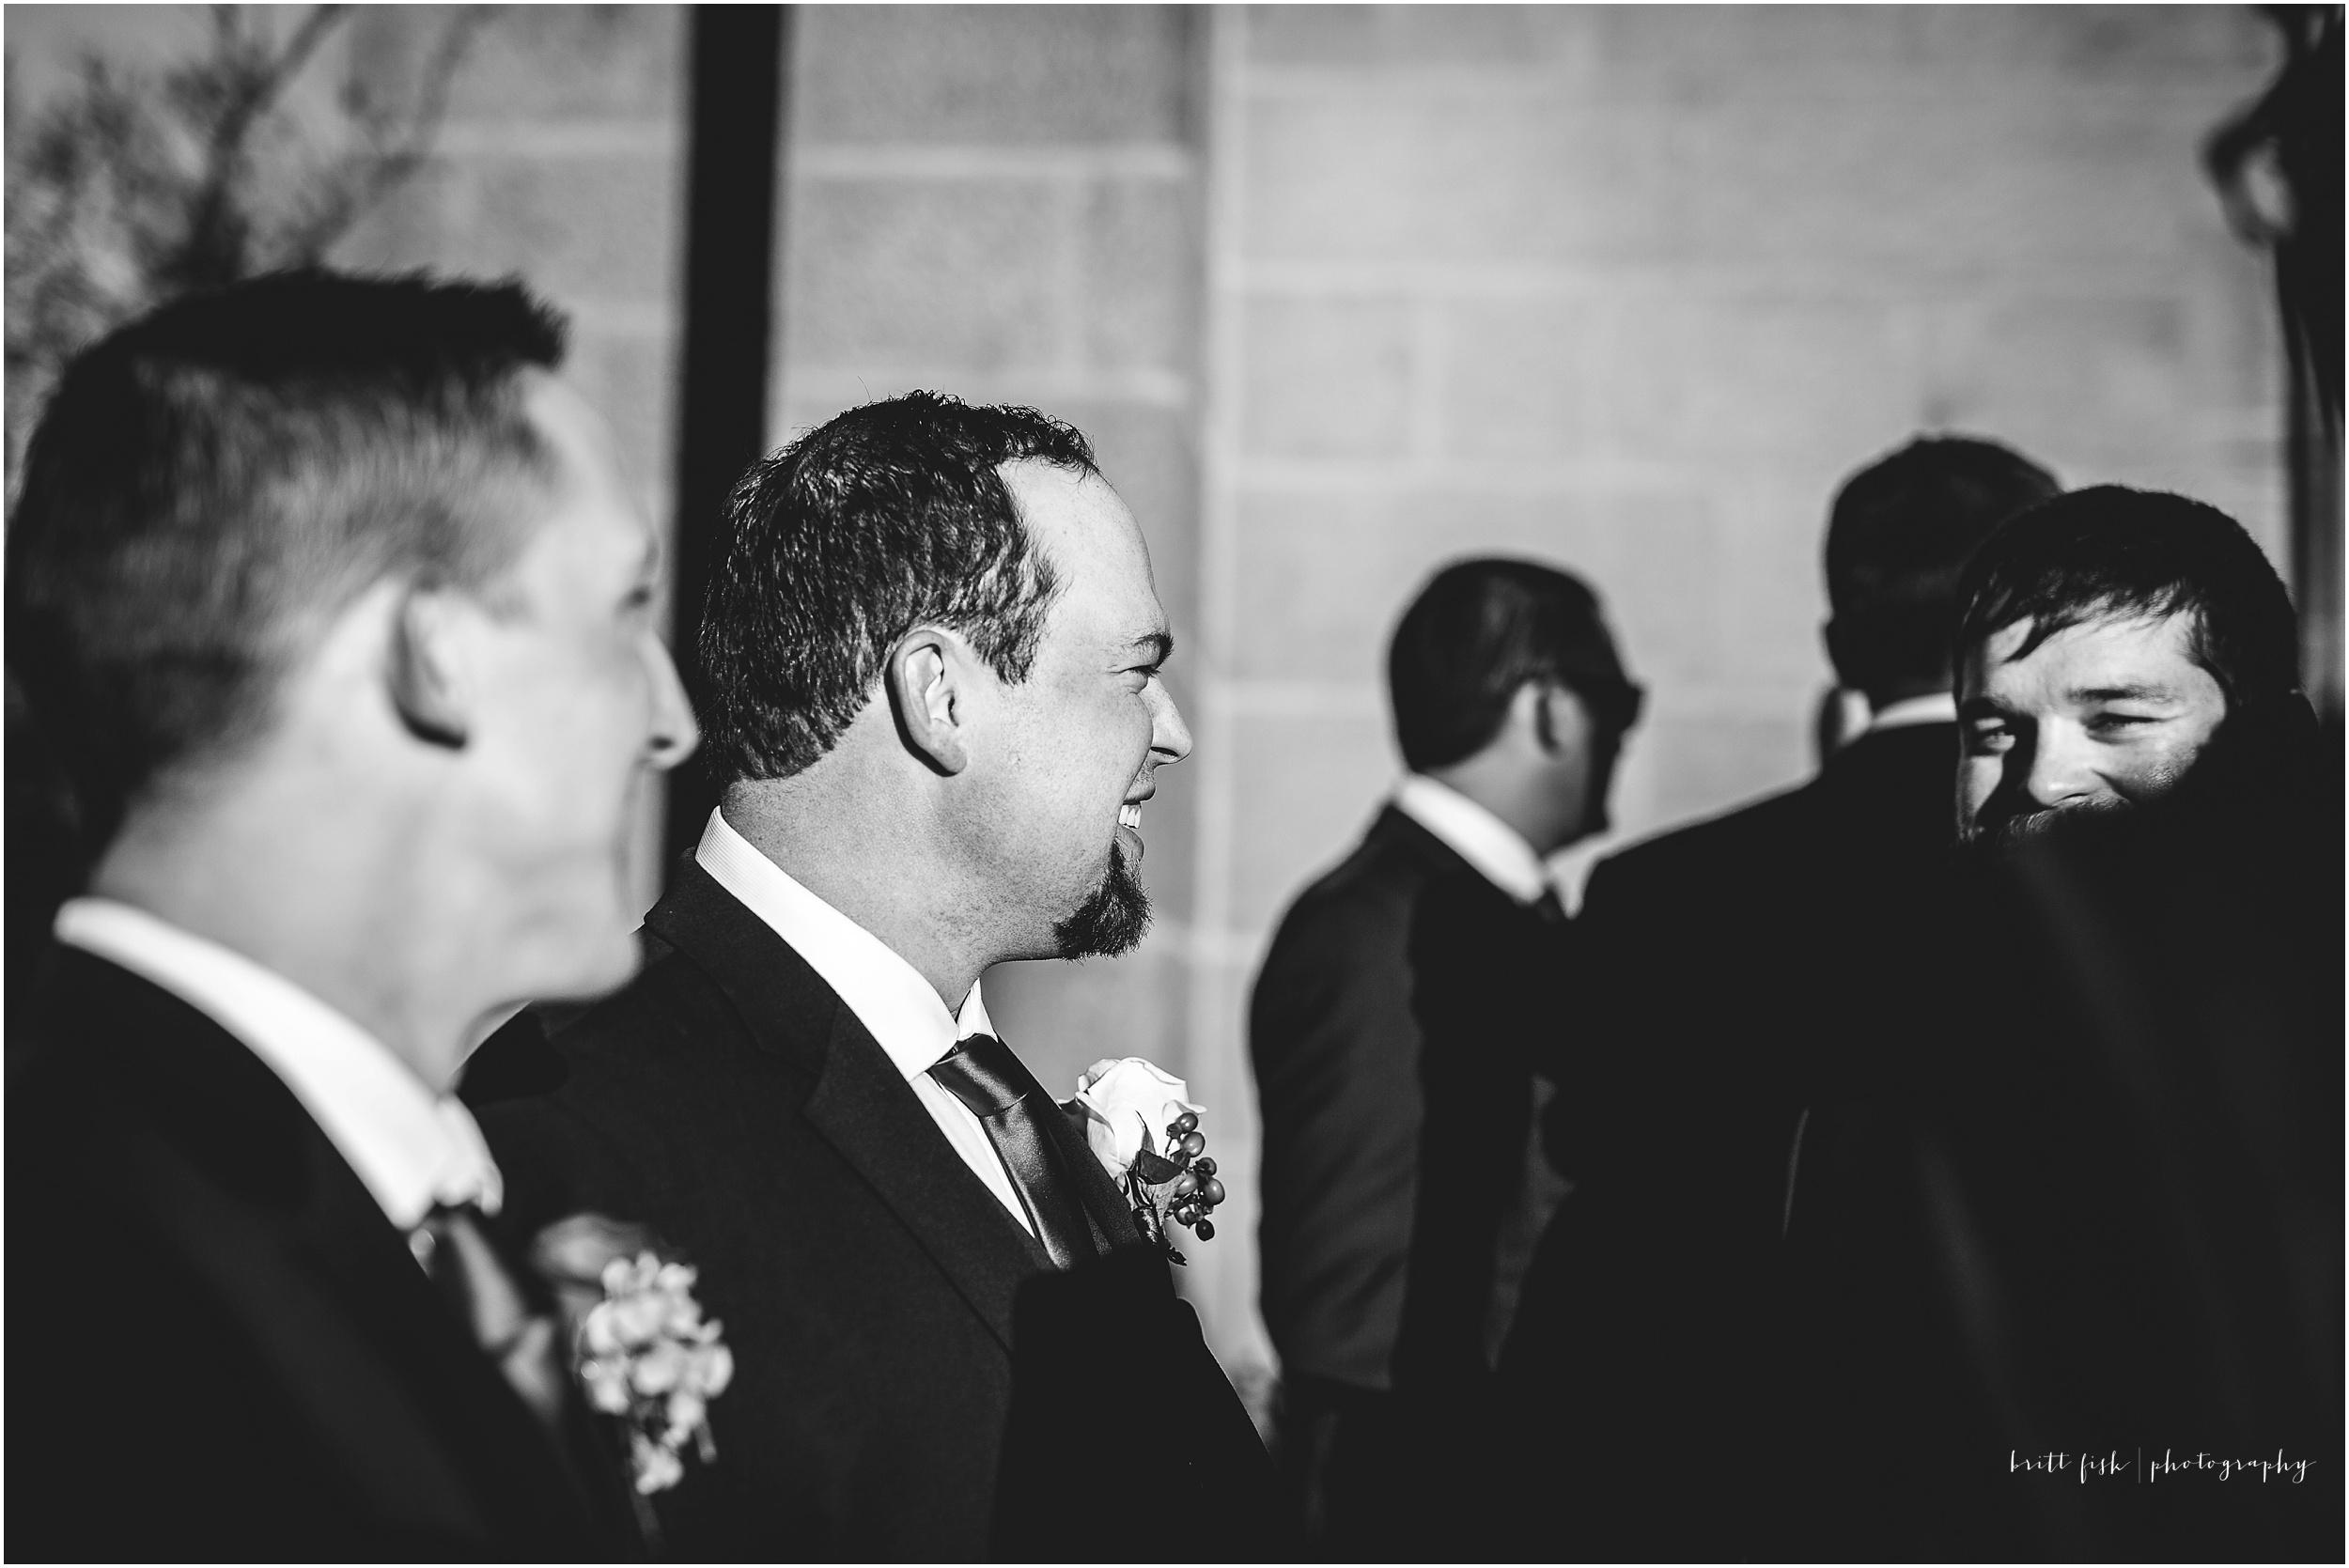 Wedding - Wood - Santa Fe, NM_0016.jpg